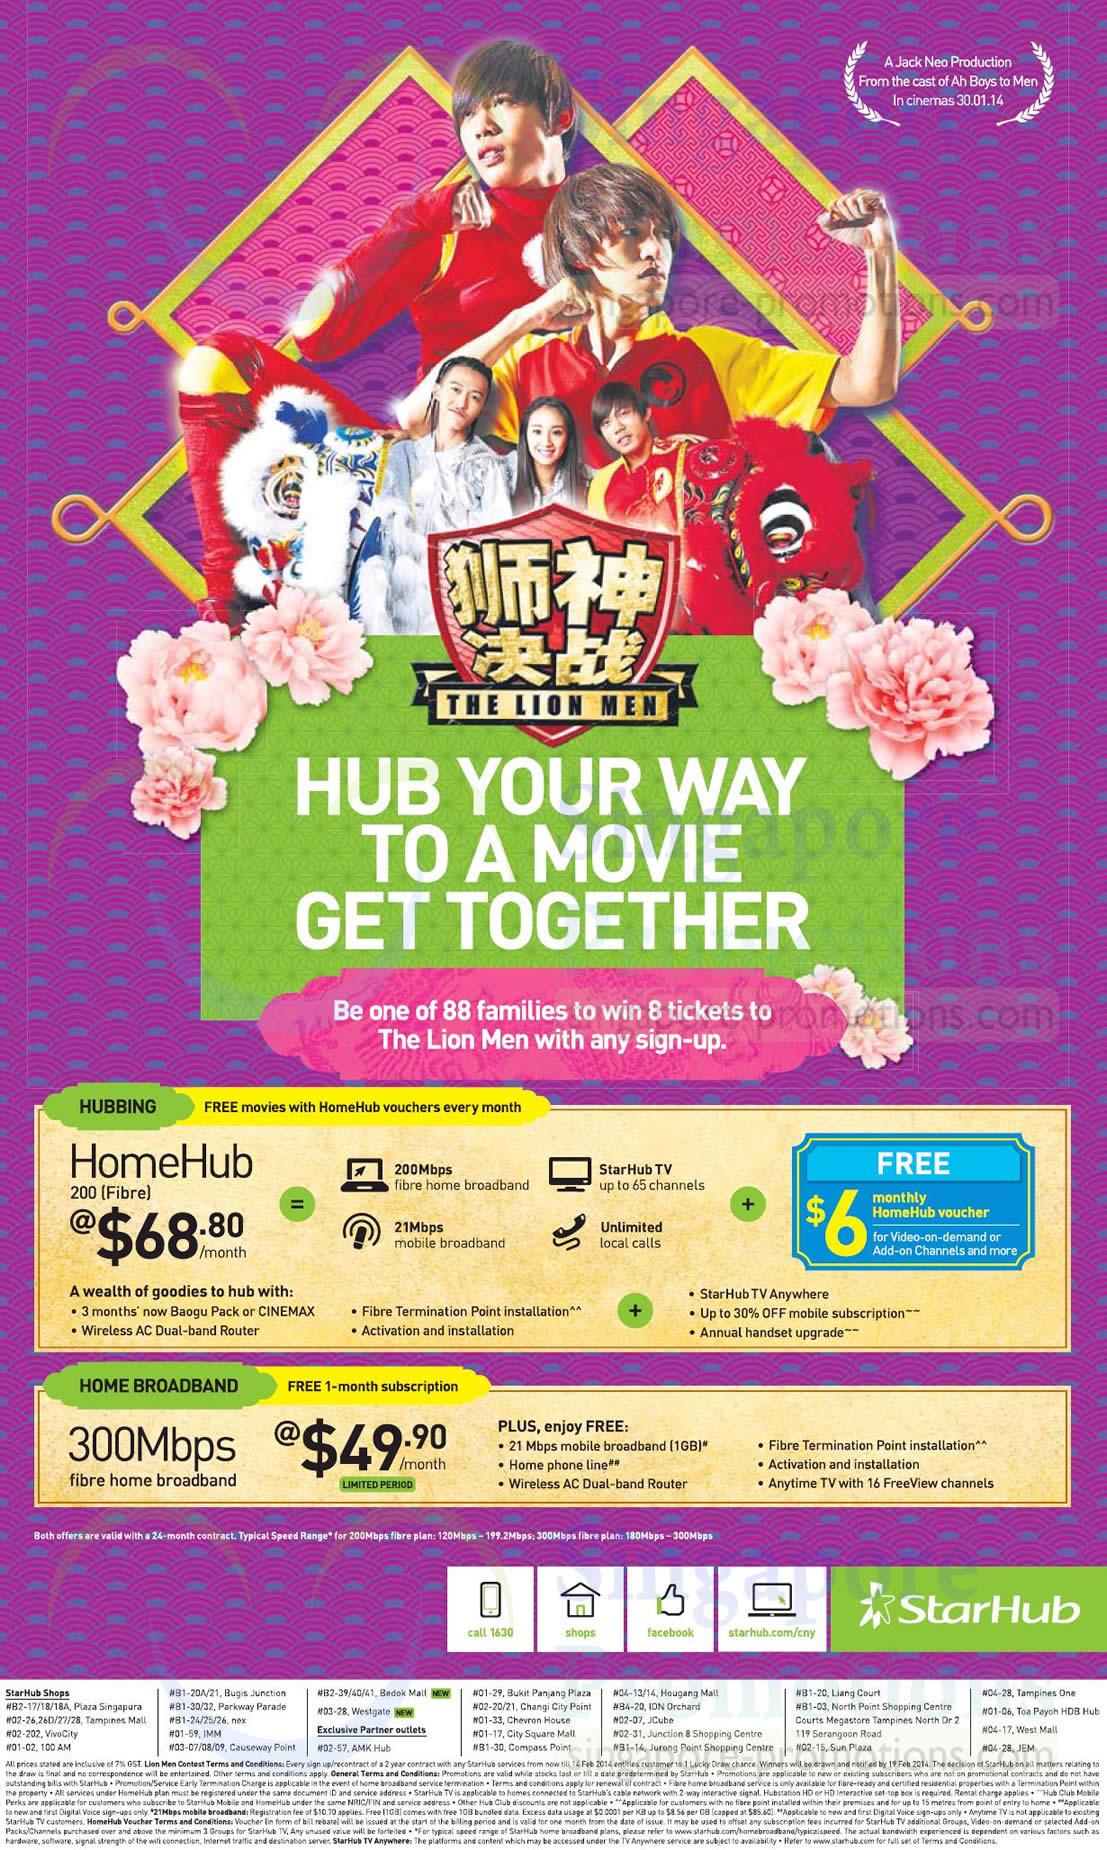 200Mbps HomeHub Fibre Broadband 68.80, 300mbps 49.90 1 Month Free